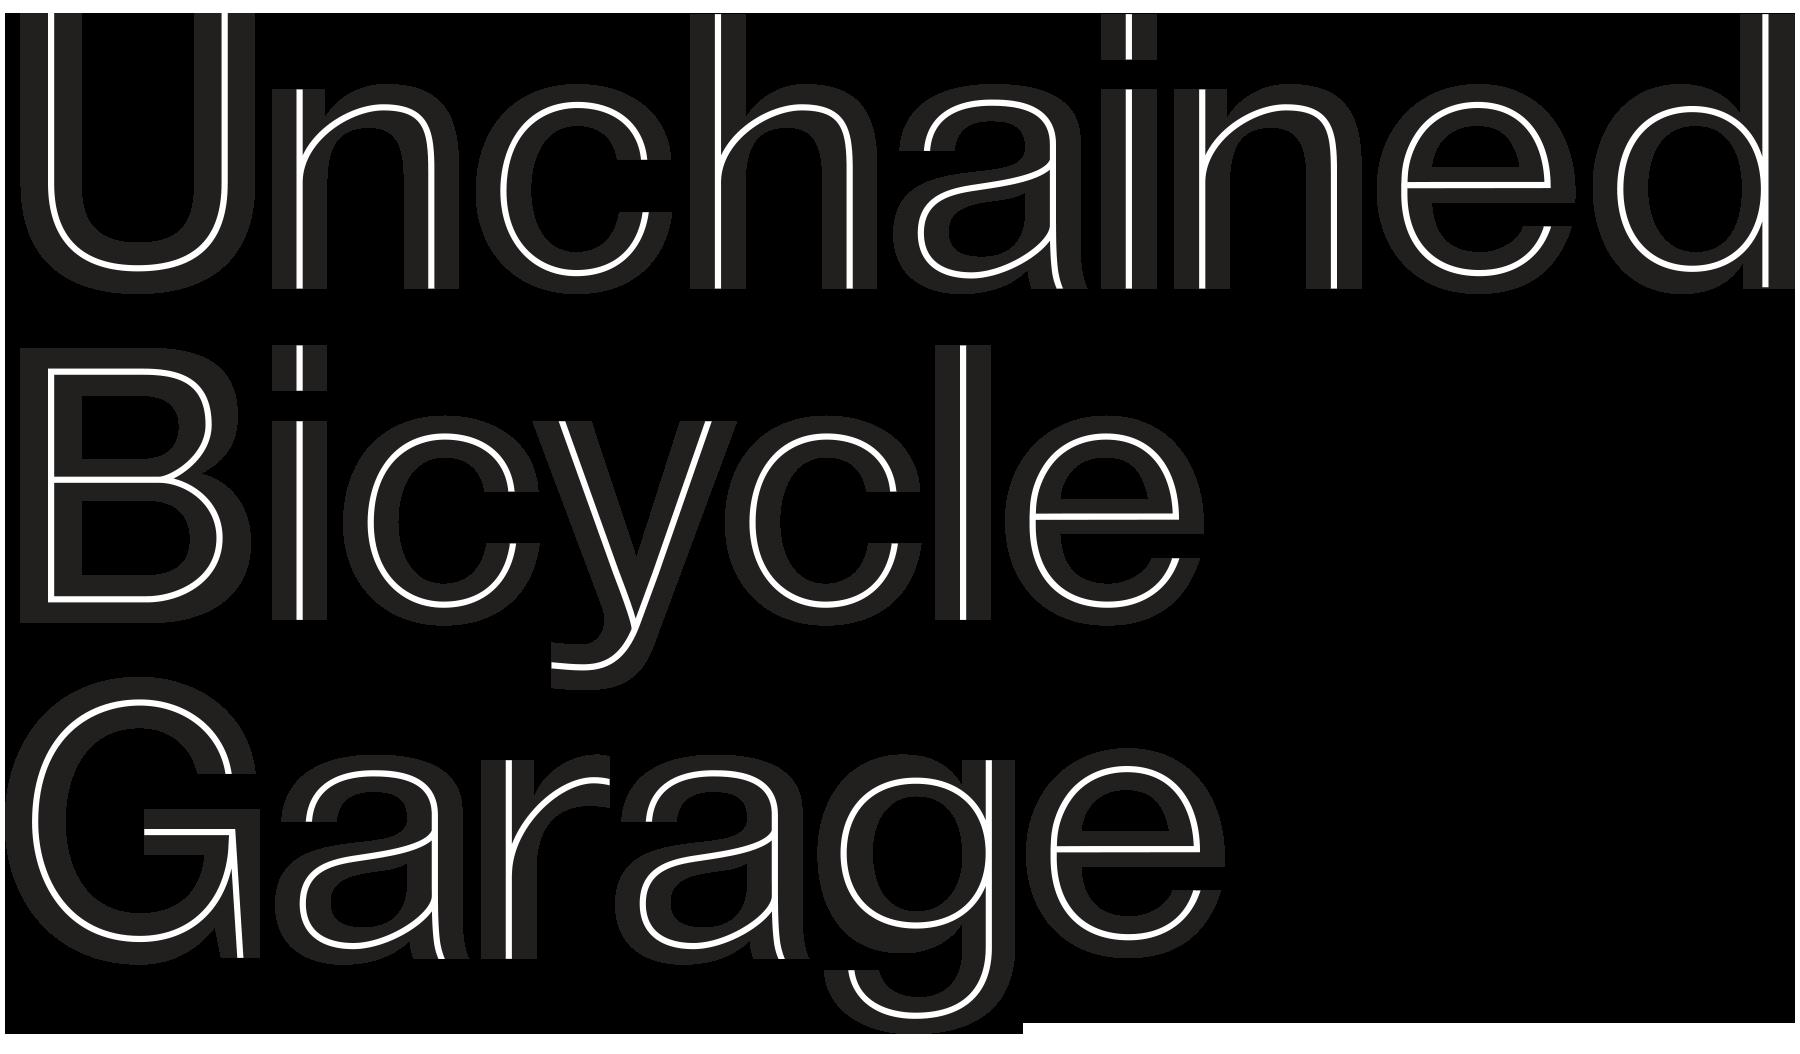 Sponsor Unchained Bicycle Garage